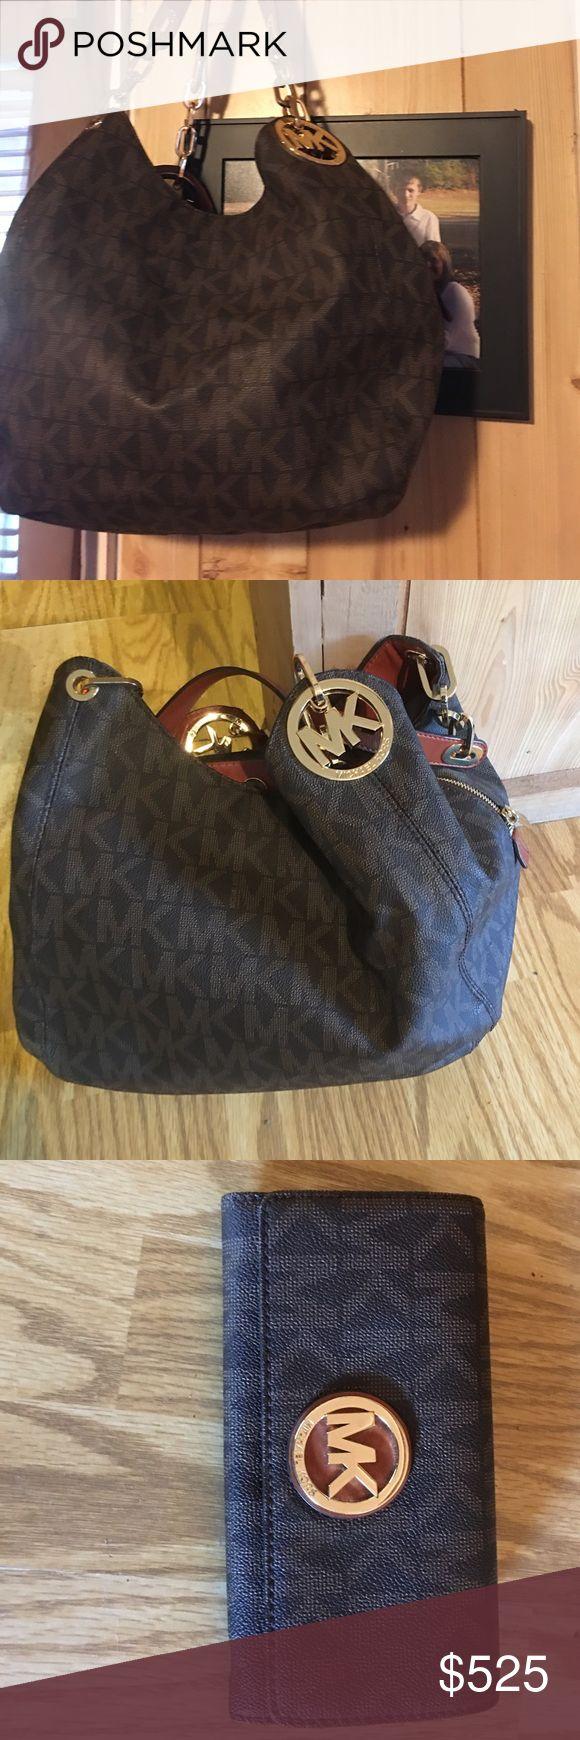 Brand New Micheal Kors Handbag & Wallet Handbag & Wallet.. I only used it briefly & did not like it. It is brand new. KORS Michael Kors Bags Hobos